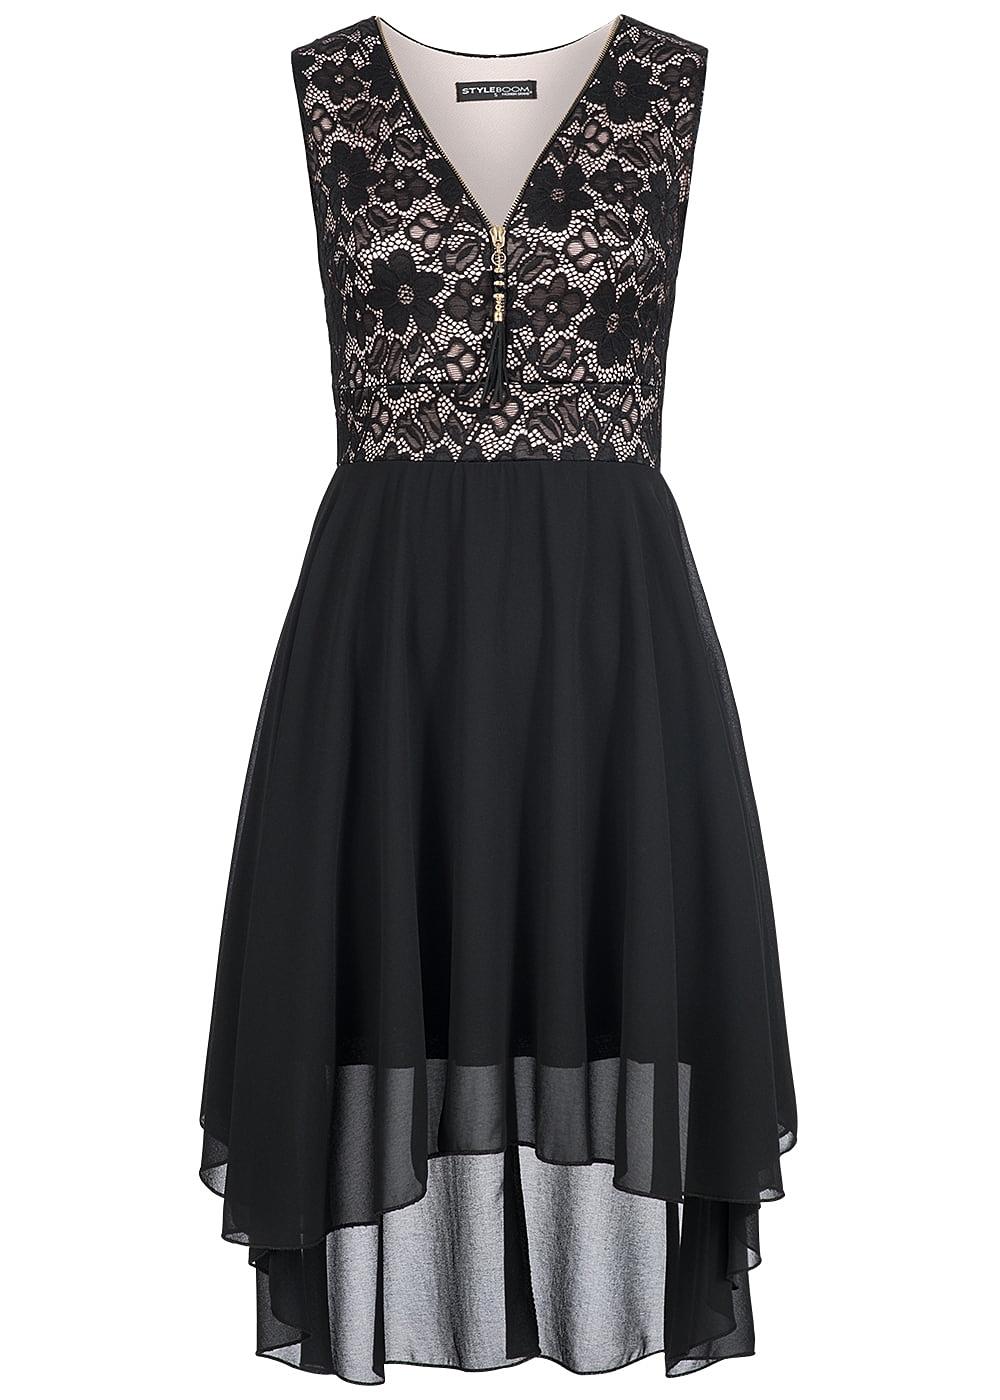 Styleboom Fashion Damen Kleid Vokuhila Zipper Spitze schwarz rosa ...